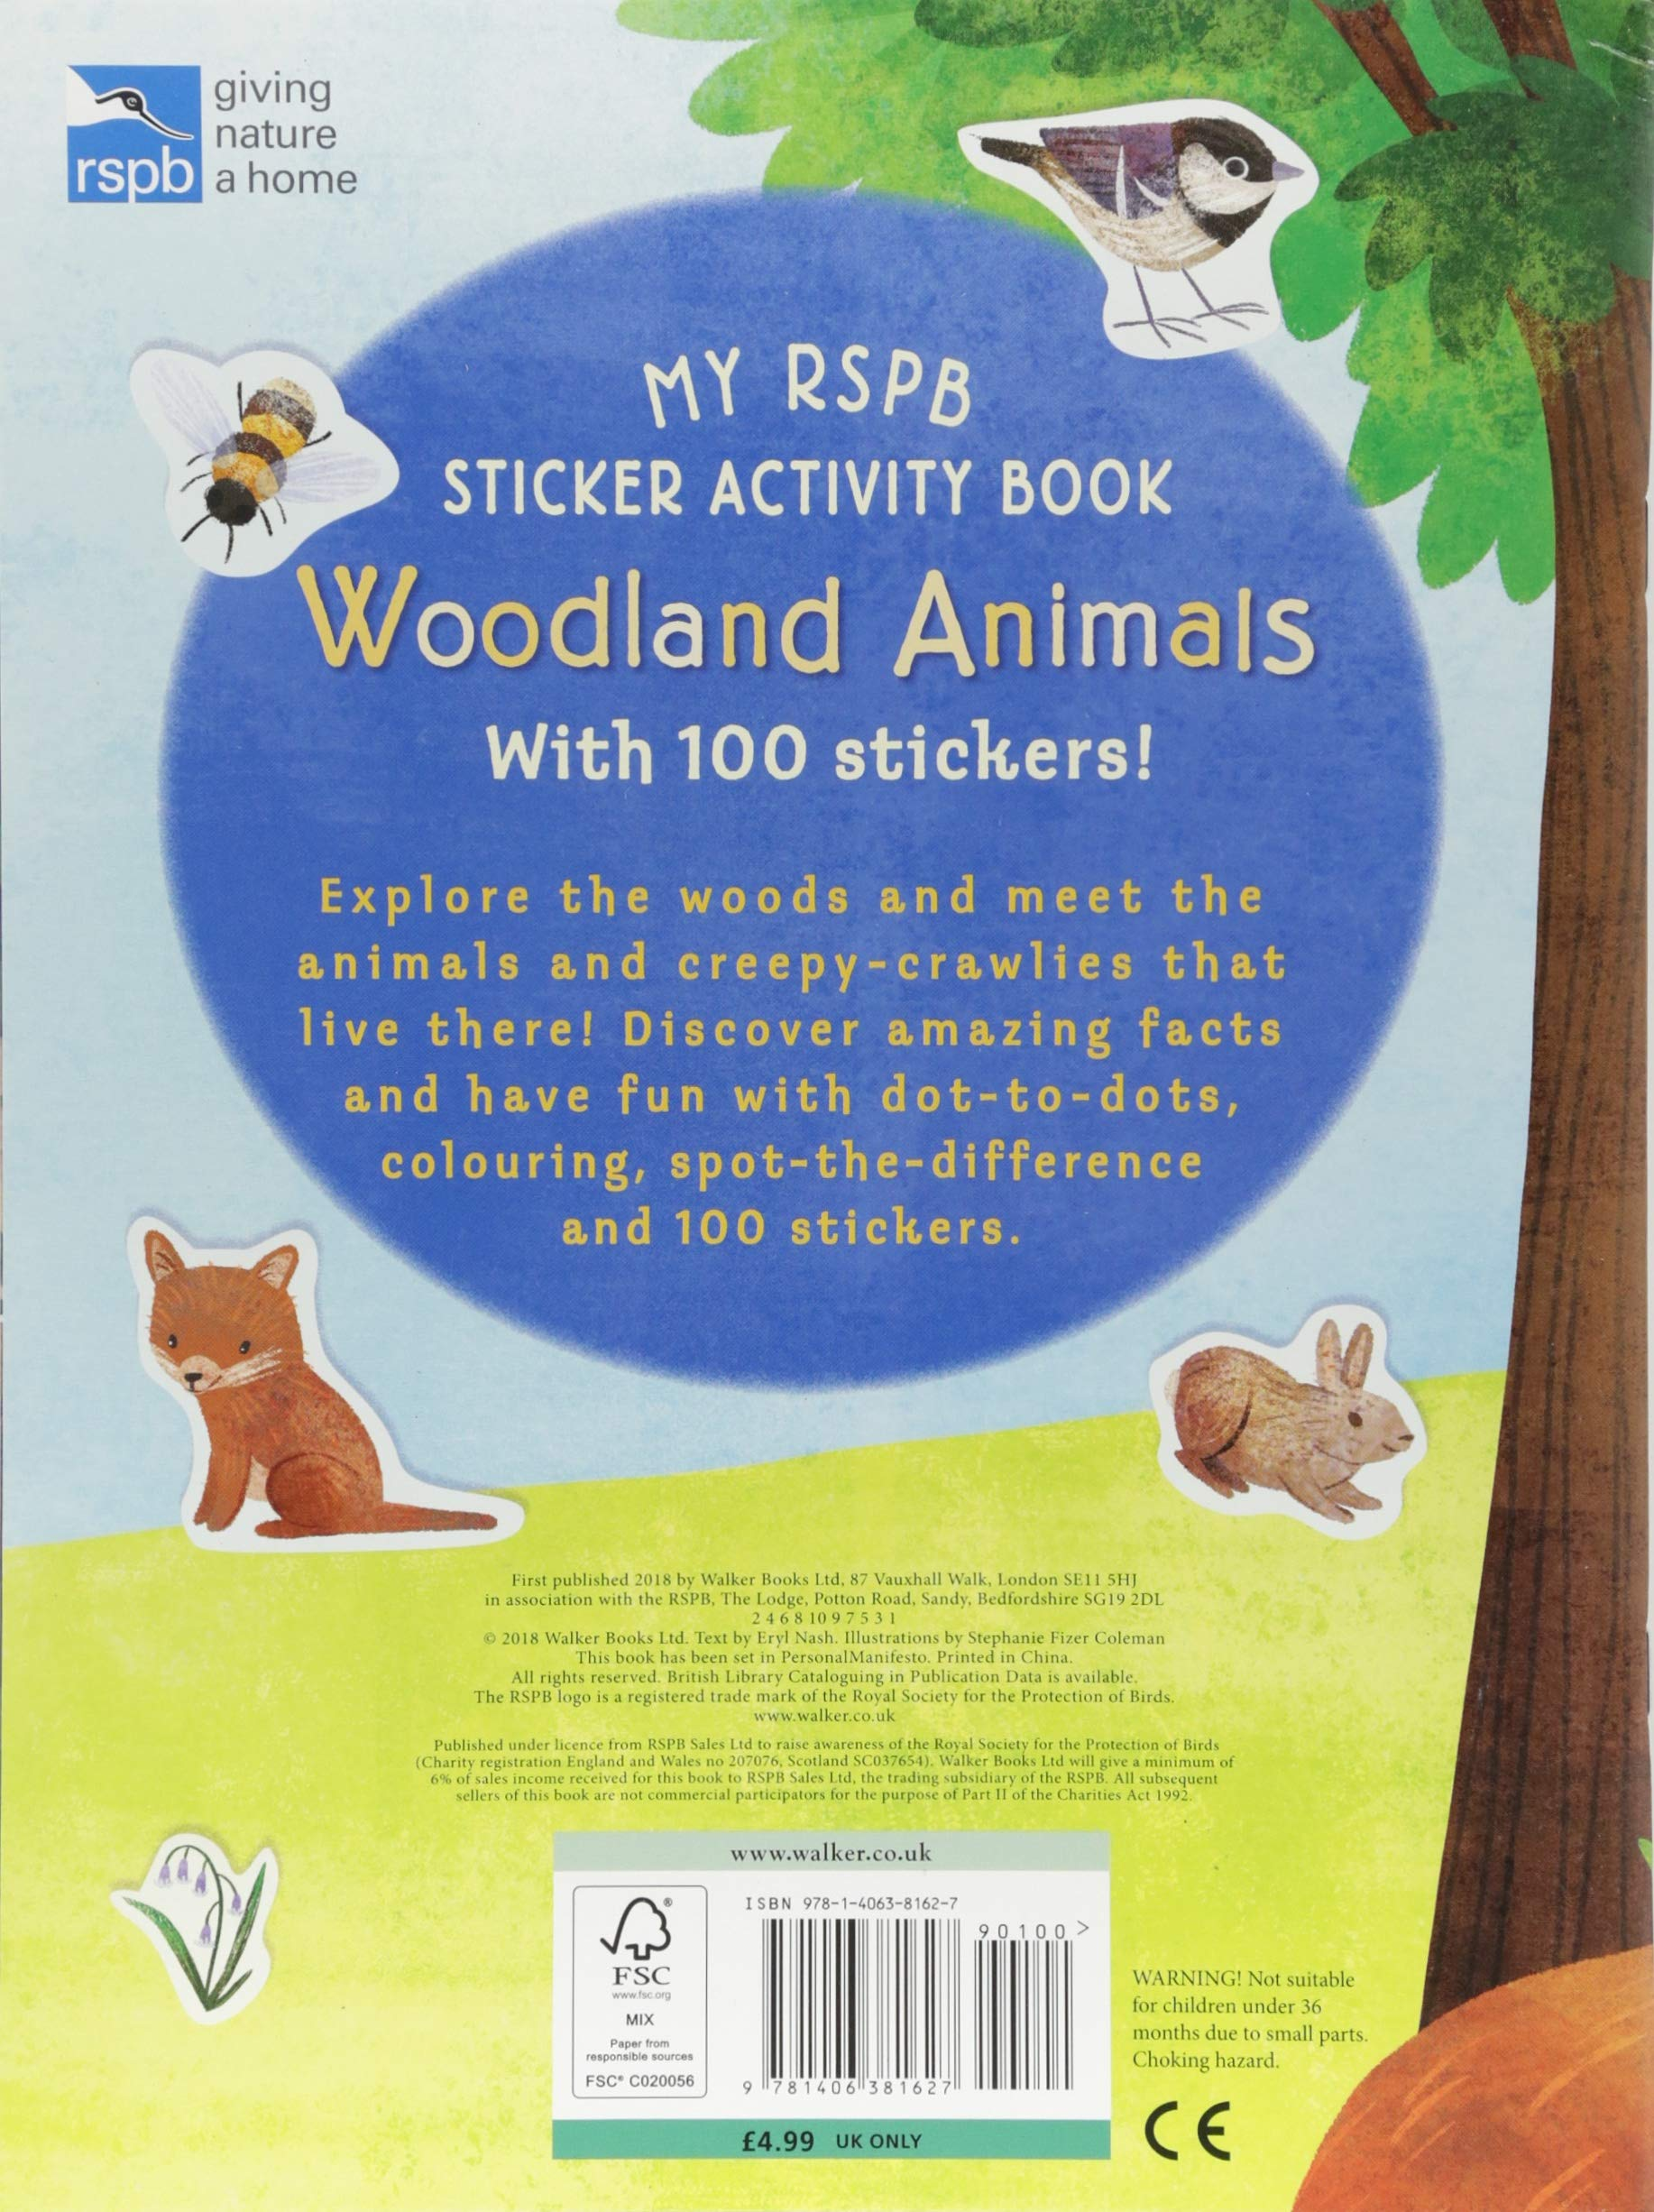 My rspb sticker activity book woodland animals amazon co uk eryl nash stephanie fizer coleman books